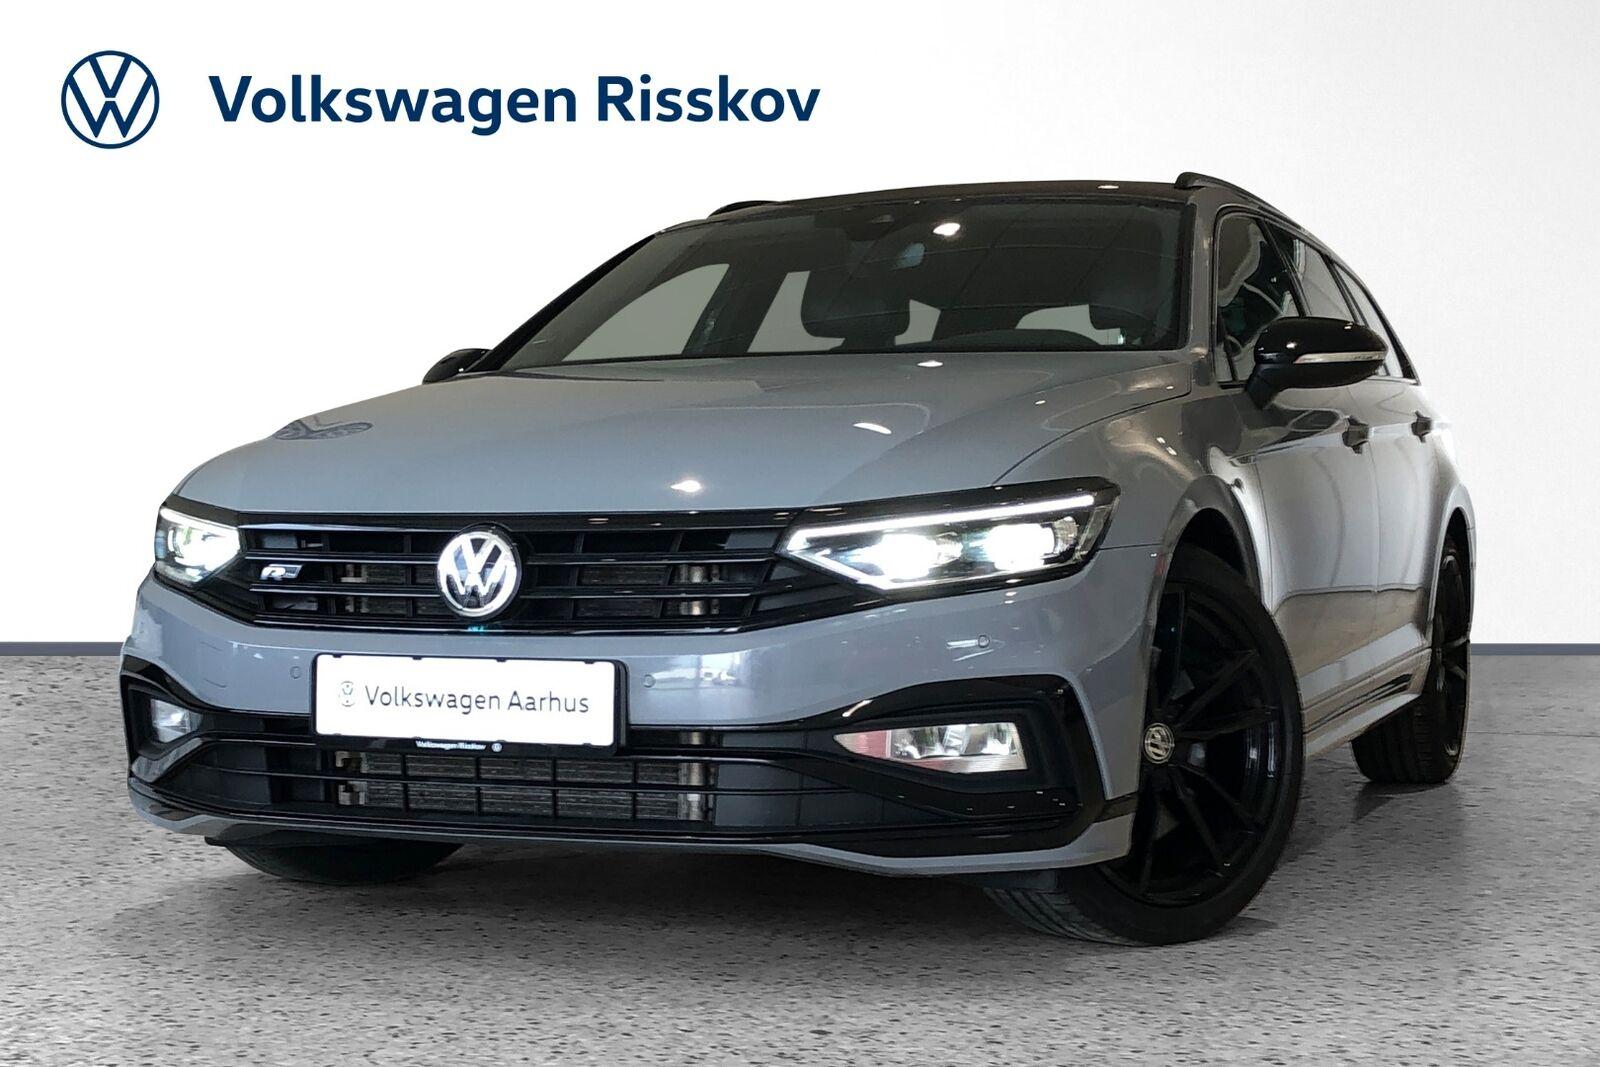 VW Passat 2,0 TDi 240 R-line Variant DSG 4M 5d - 619.900 kr.